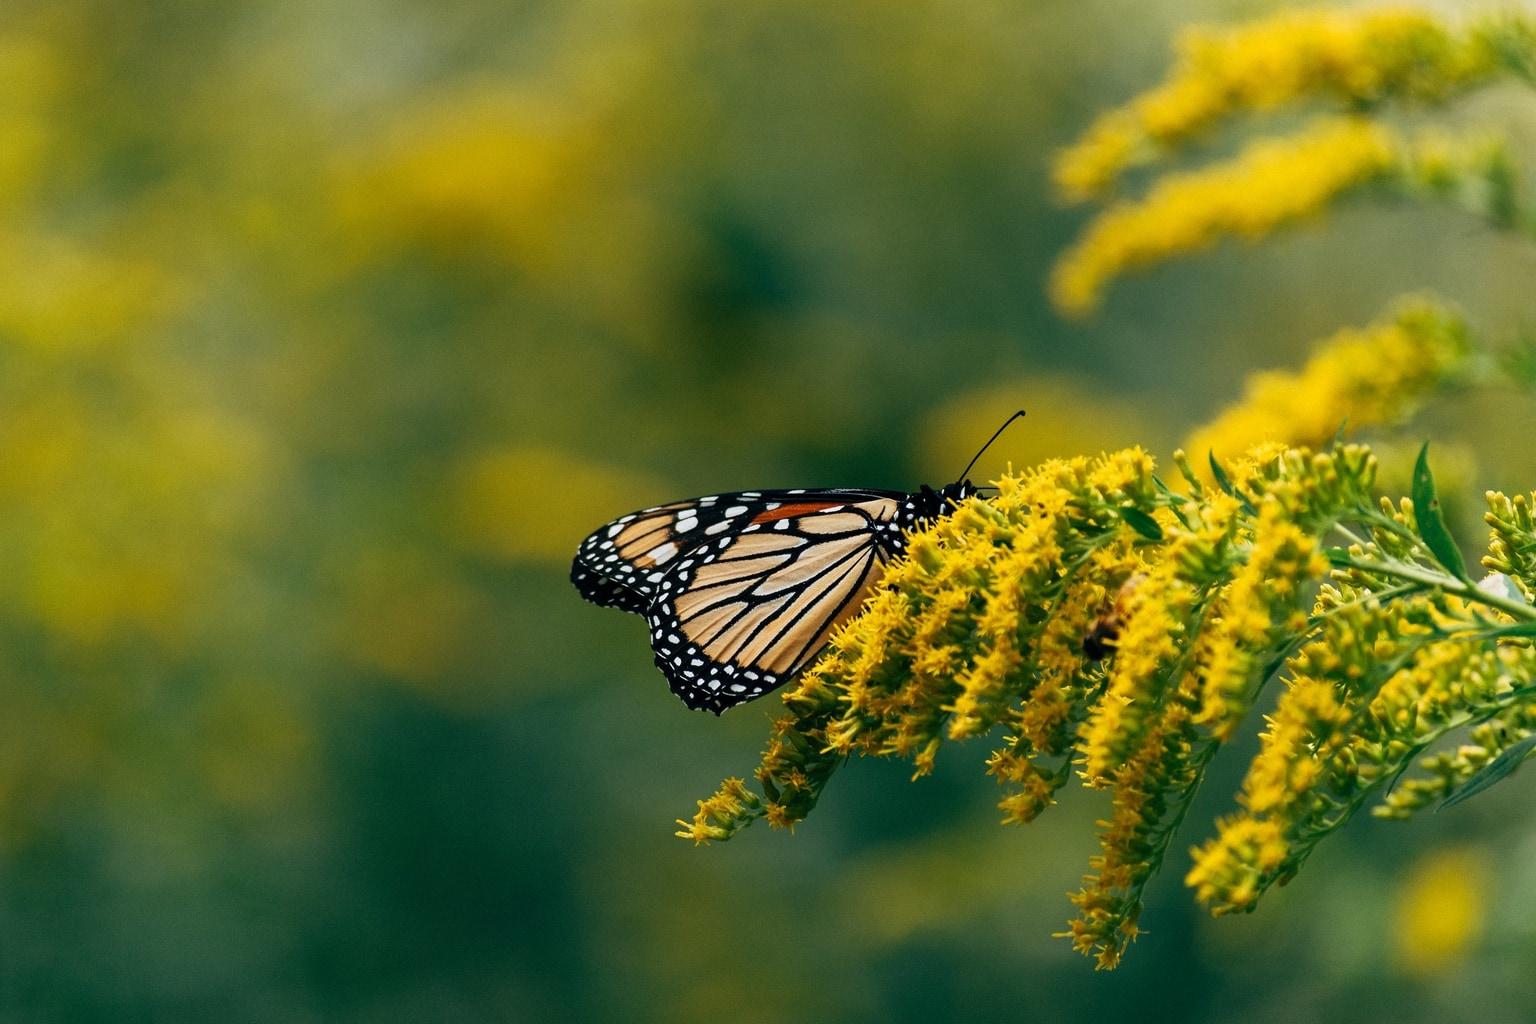 Mariposa fotografiada con una Nikon D3500